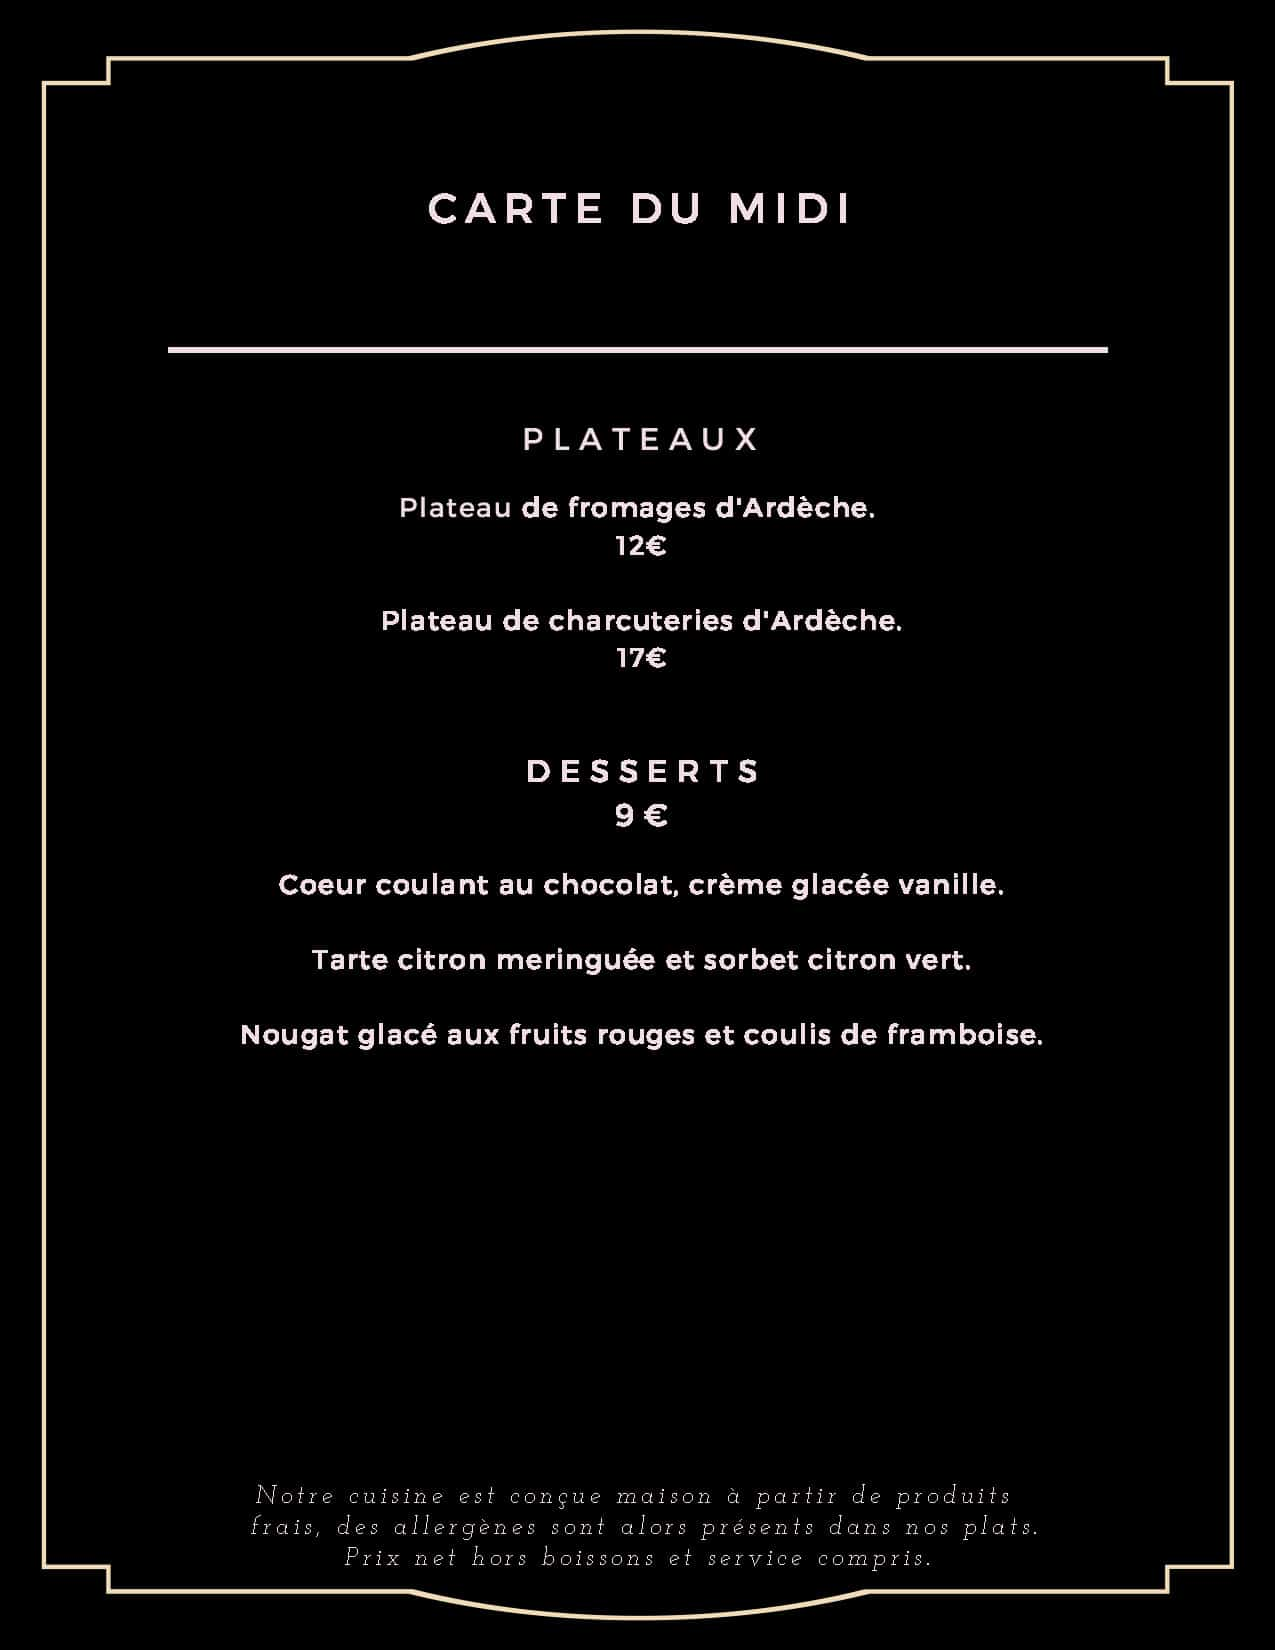 carte du midi desserts - carte-du-midi-desserts